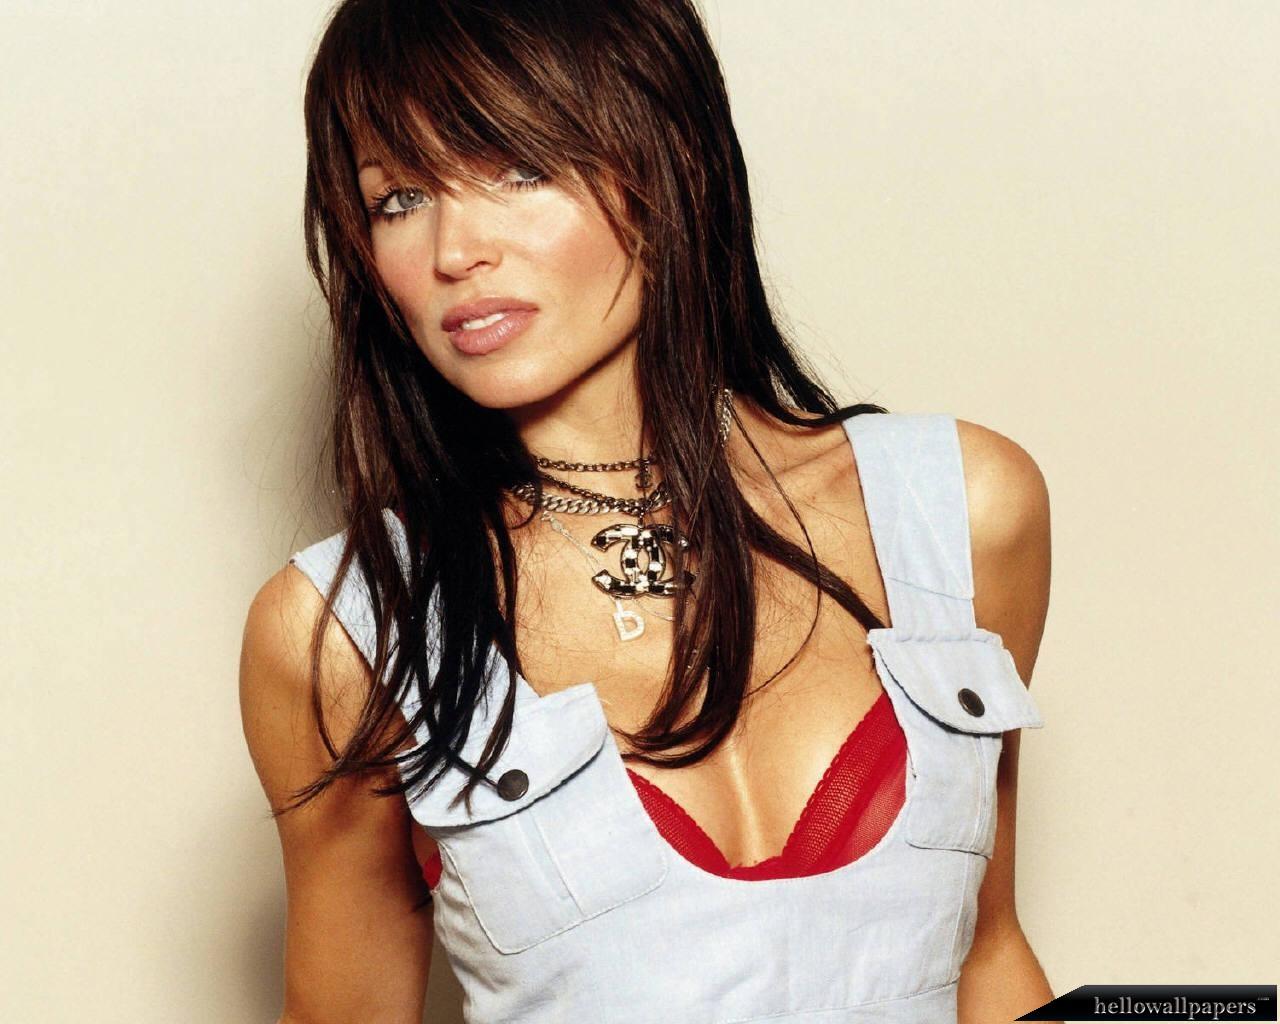 http://2.bp.blogspot.com/_1VIIu3Zv-cw/S7CId3q4f5I/AAAAAAAAEug/DDzAc2rC-E8/s1600/Dannii-Minogue-001.jpg